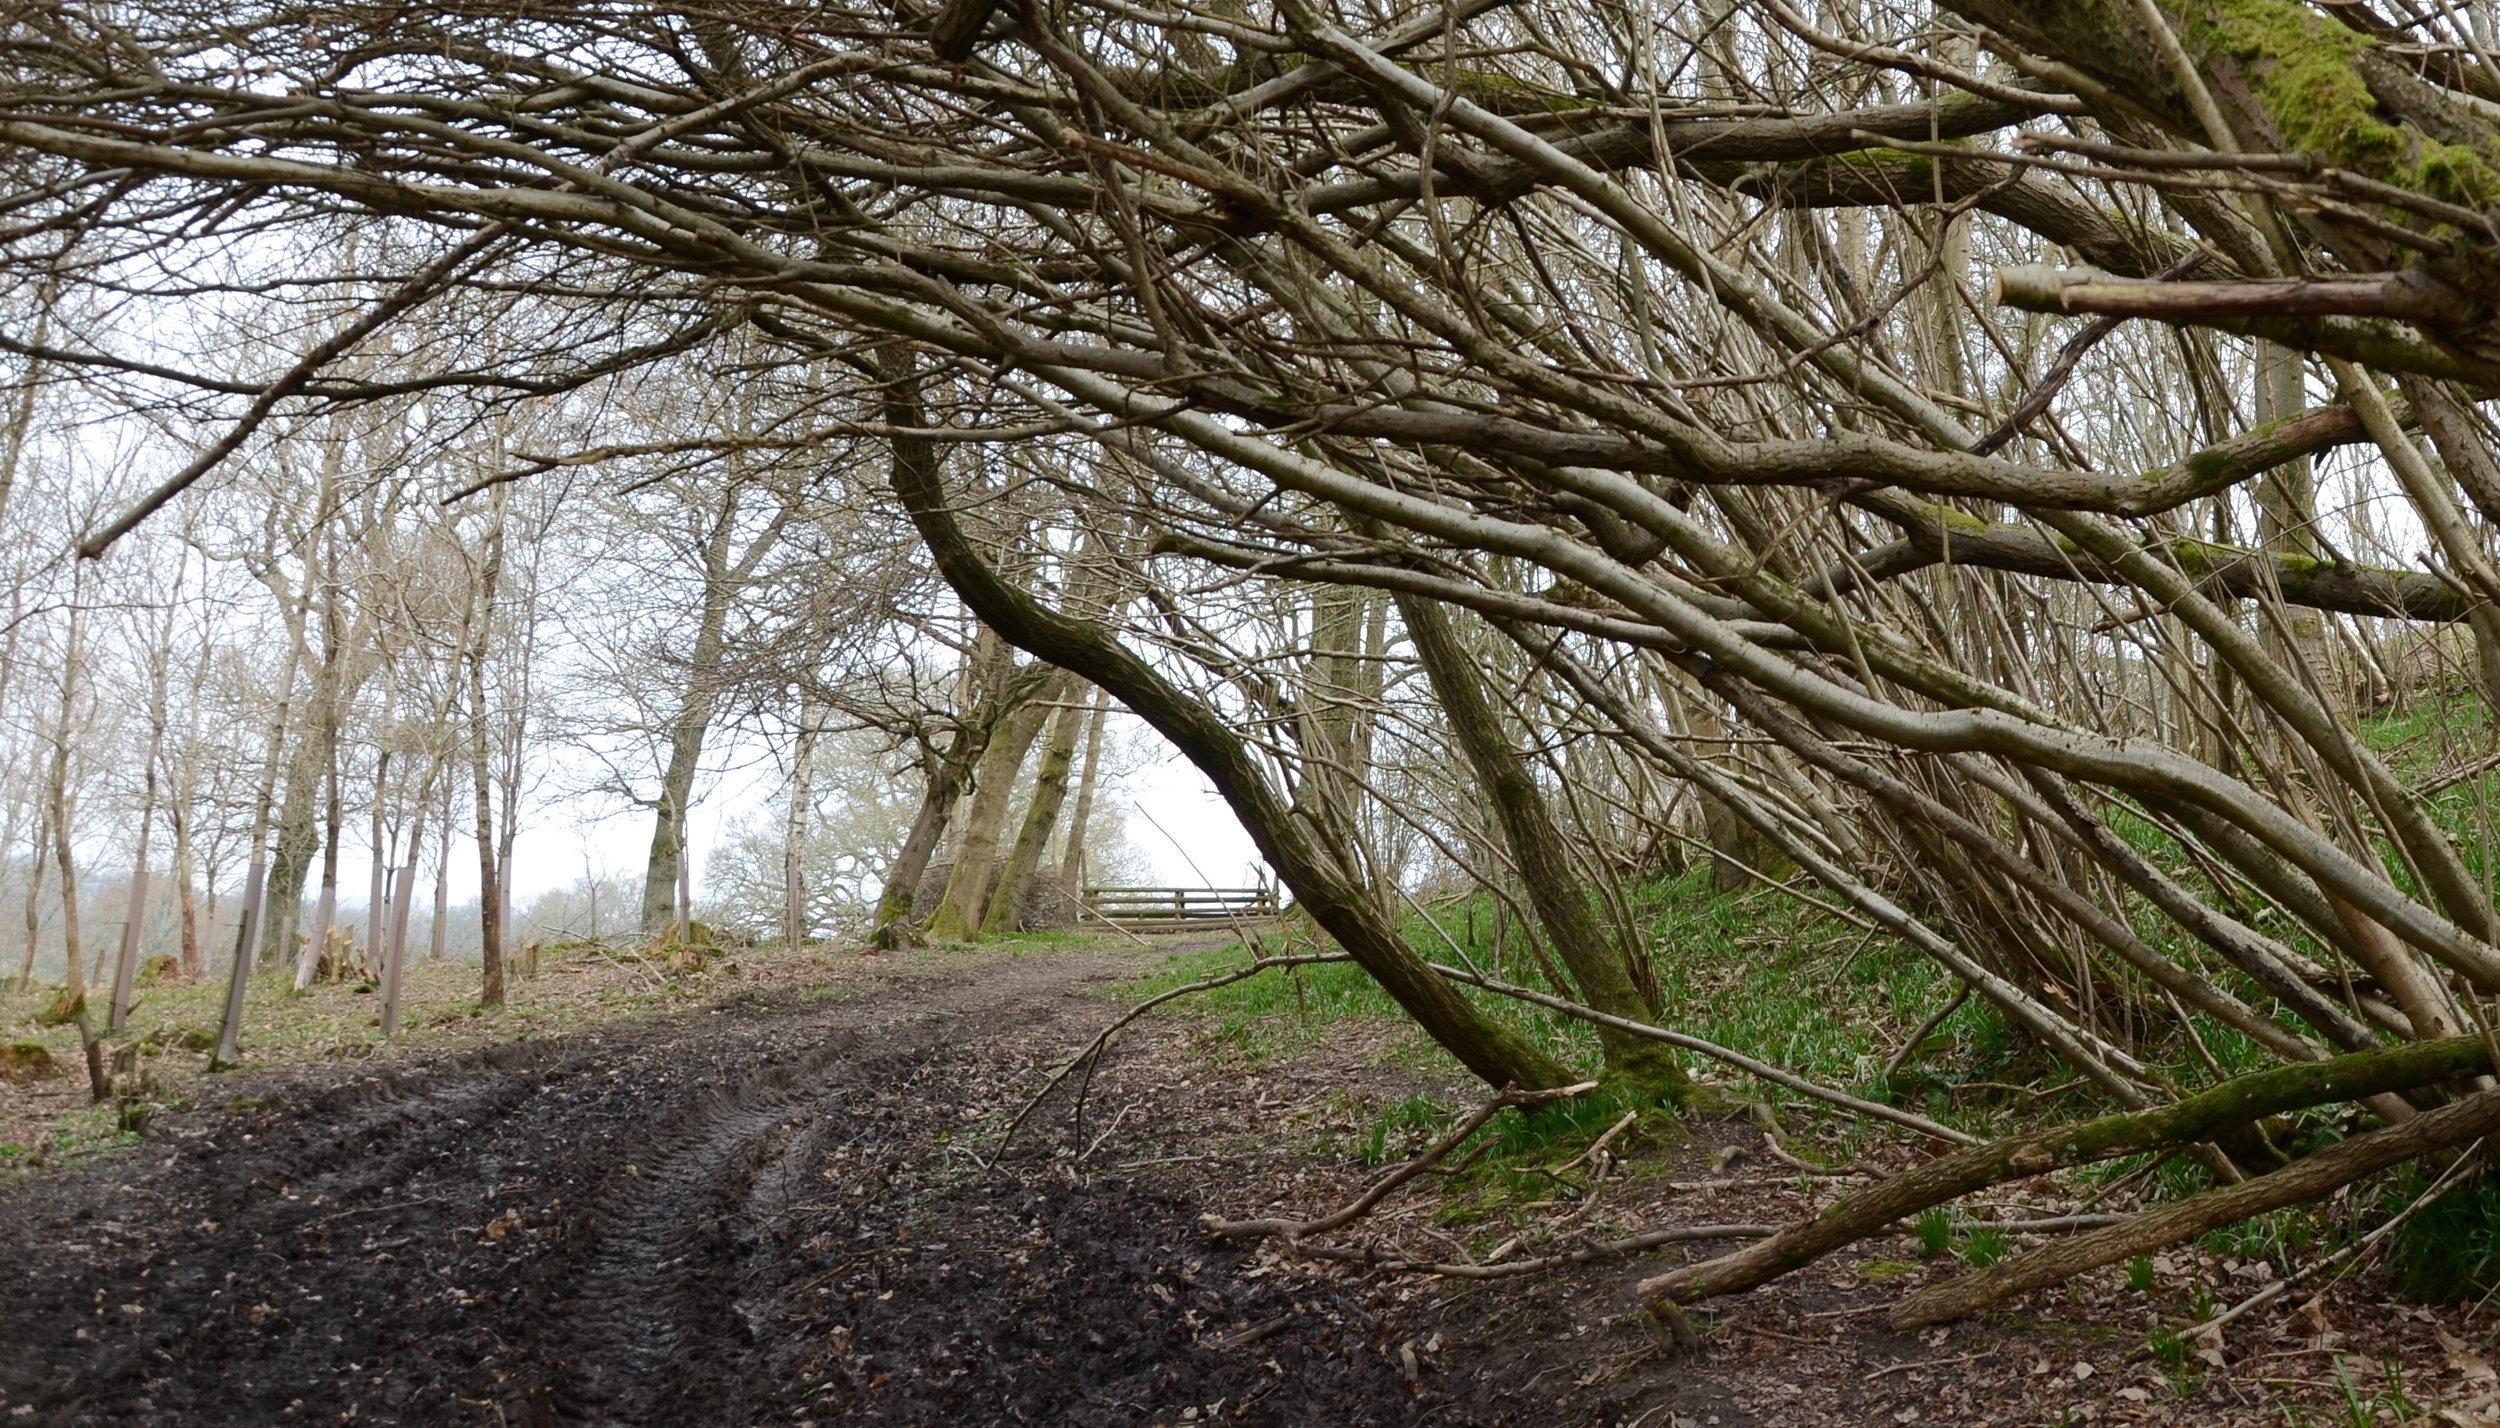 Lodsworth, Sussex